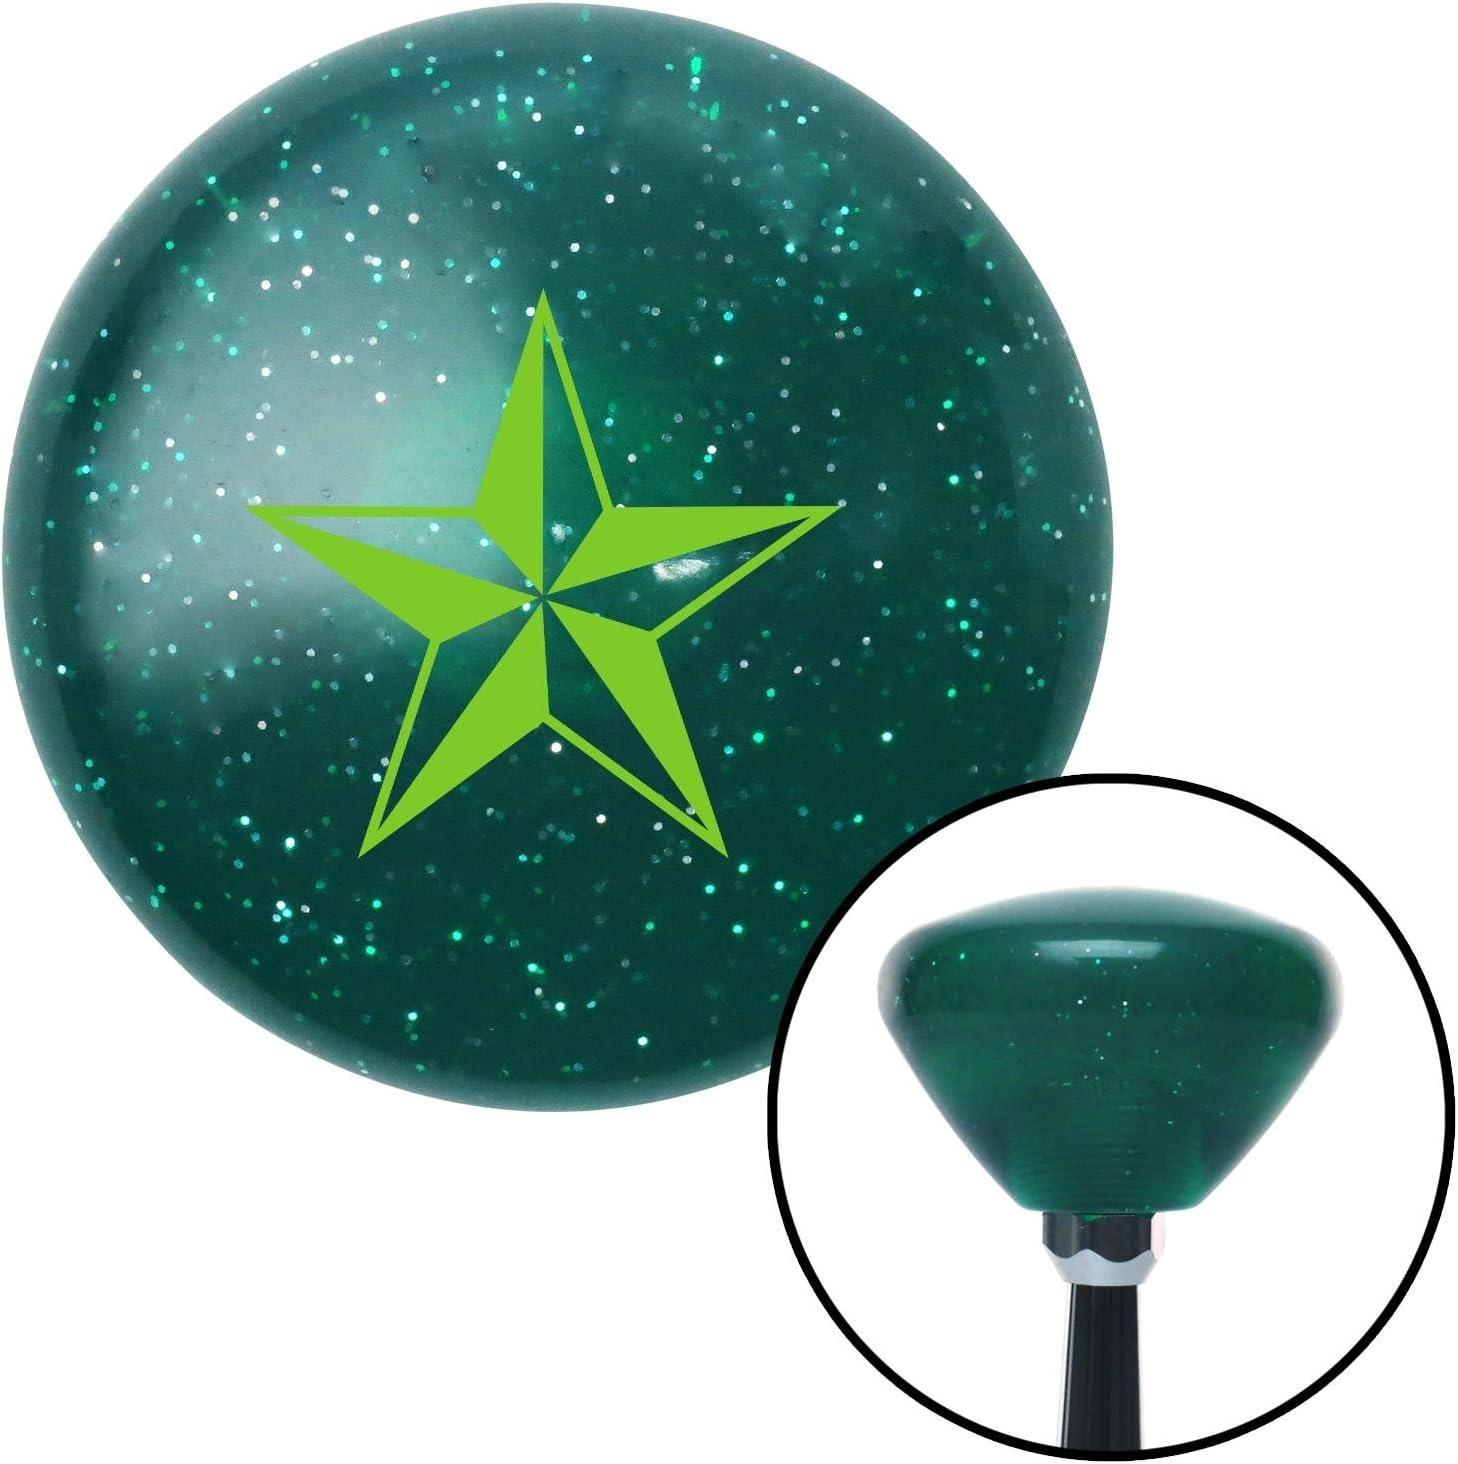 American Shifter 207608 Green Retro Metal Flake Shift Knob with M16 x 1.5 Insert Green Tattoo Star Thin